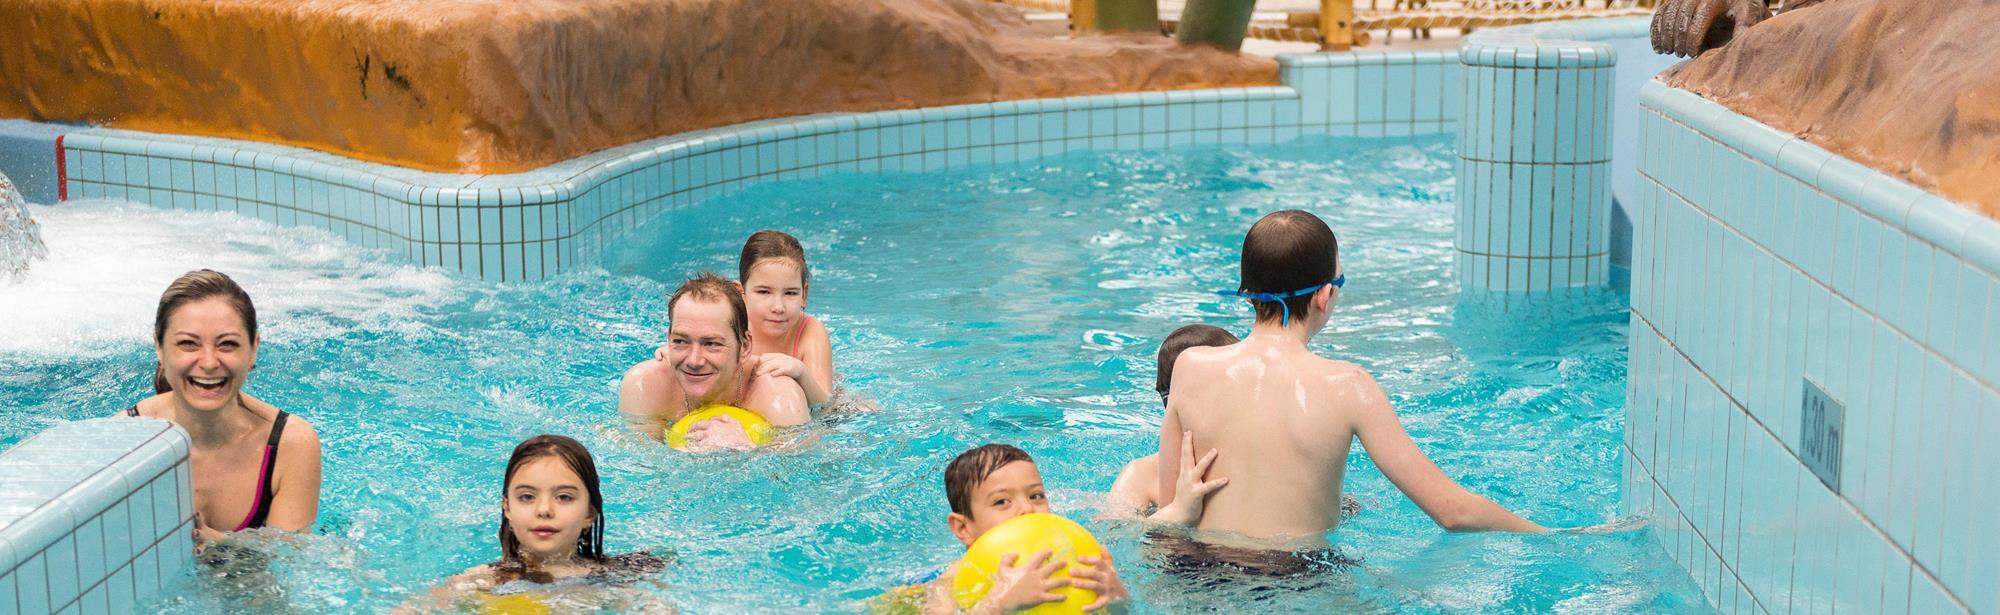 Zwemparadijs Mosaqua